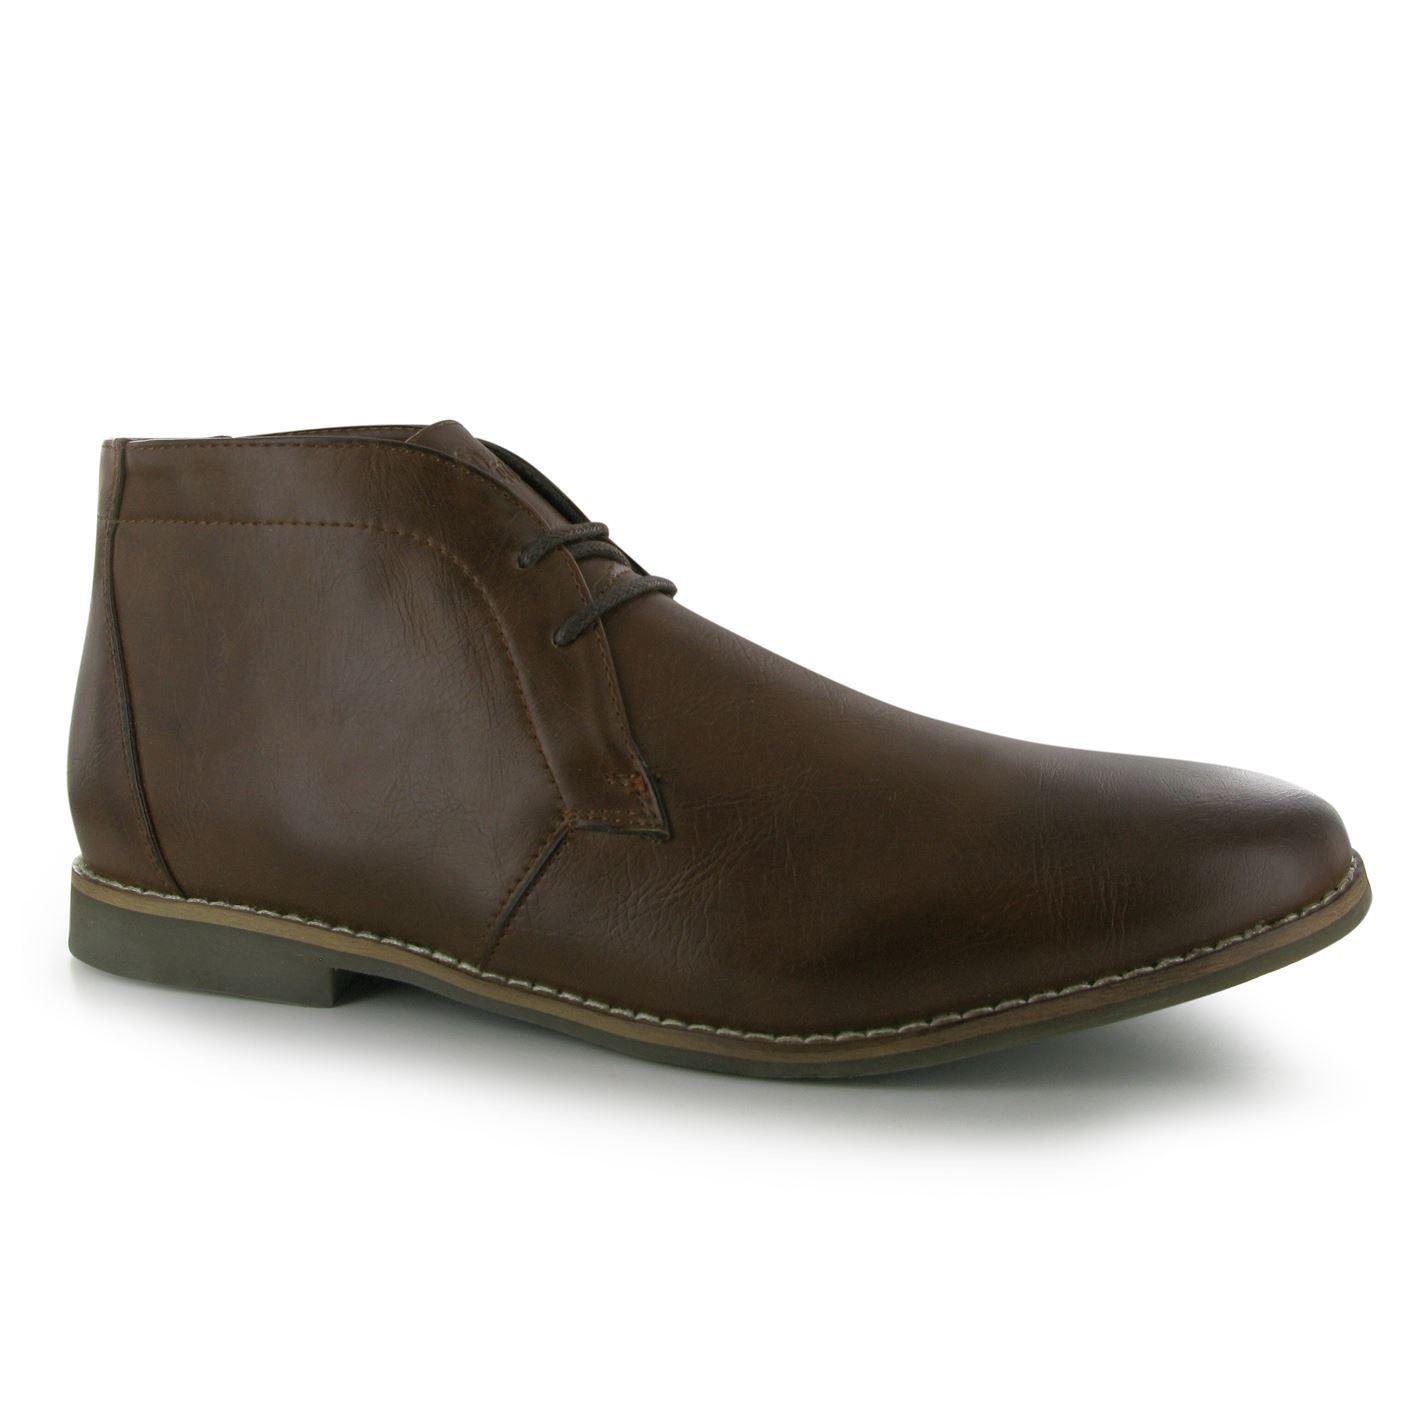 Lee Cooper Mens C Desert Smt Bt Shoes Laced Casual ...